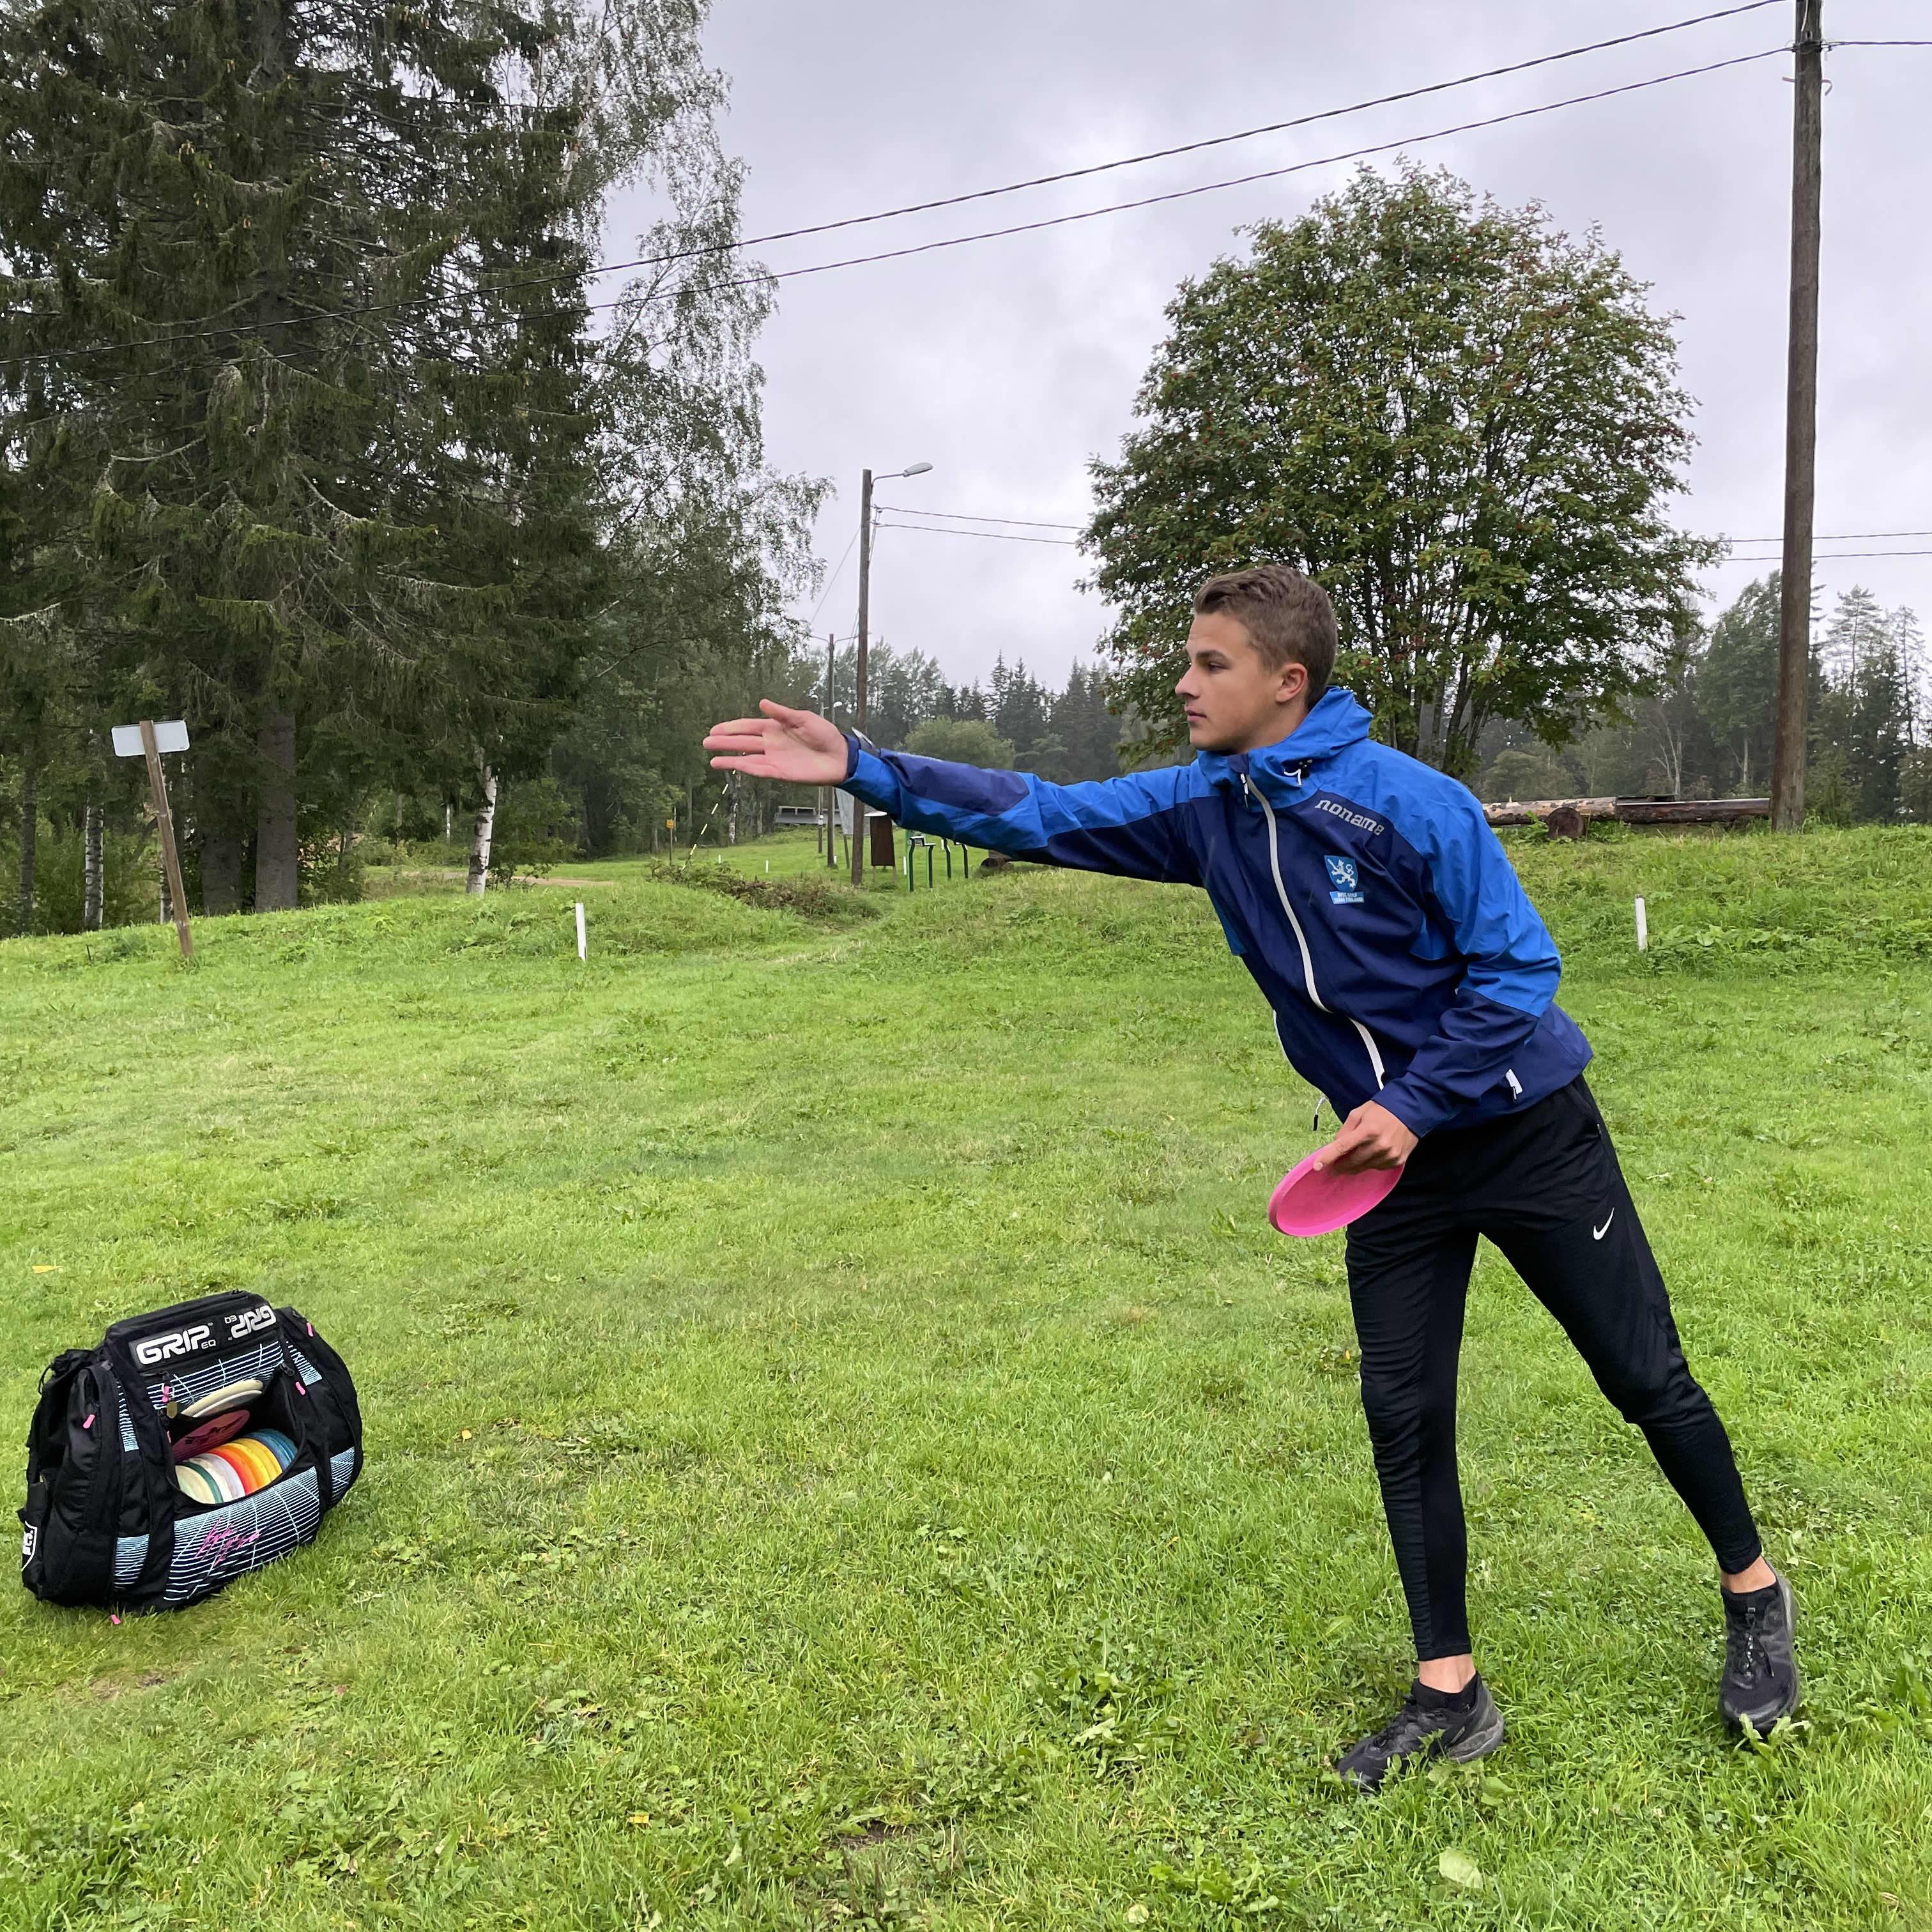 Euroopan mestari Niklas Anttila kertoo frisbeegolfkiekoista